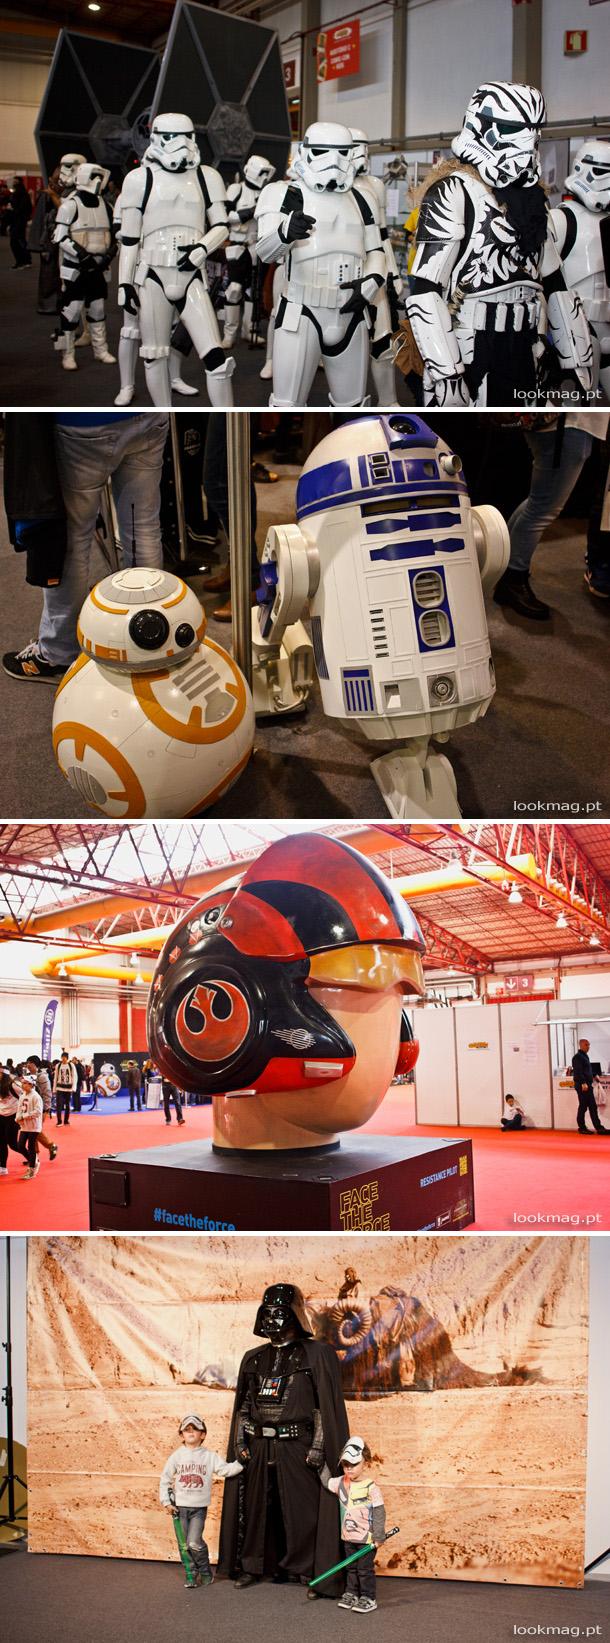 Comic_Con_2015-LookMag_pt-17-18-19-20